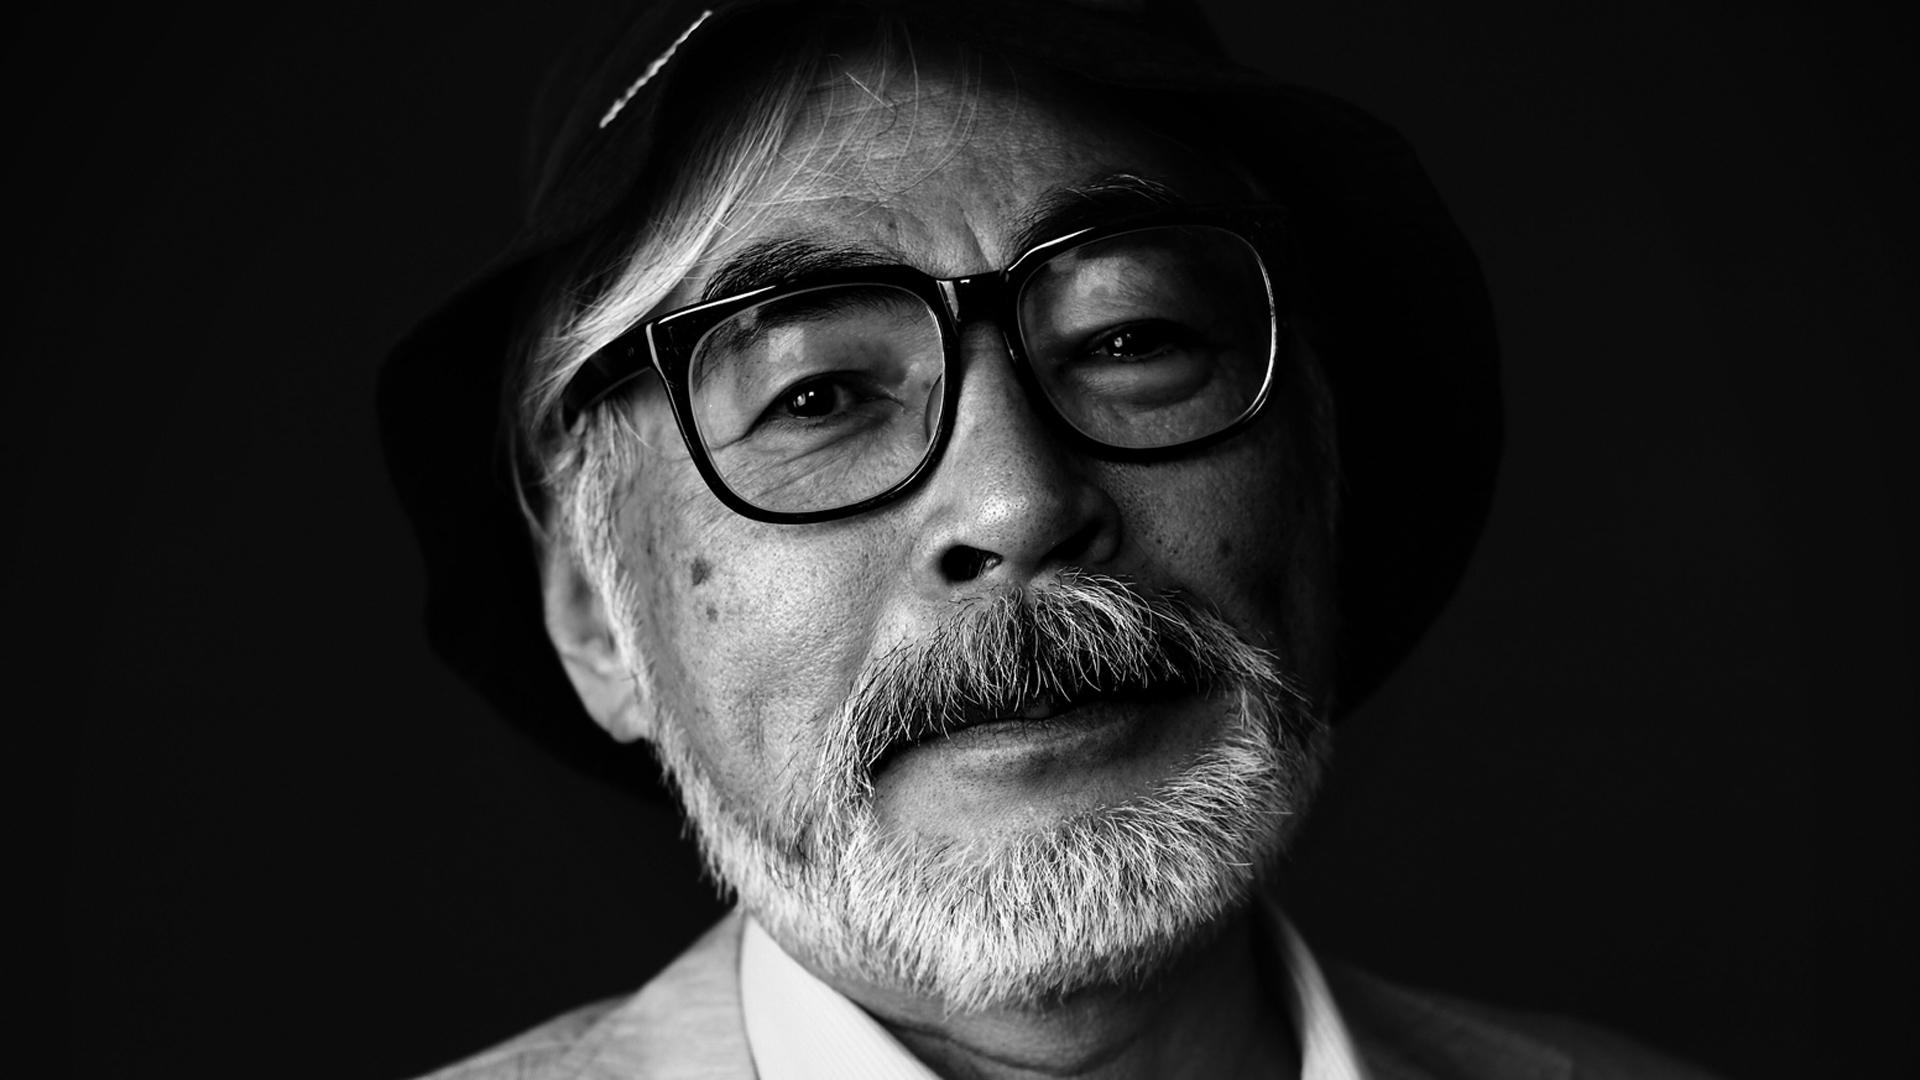 Hayao Miyazaki stronca l'intelligenza artificiale nell'animazione: